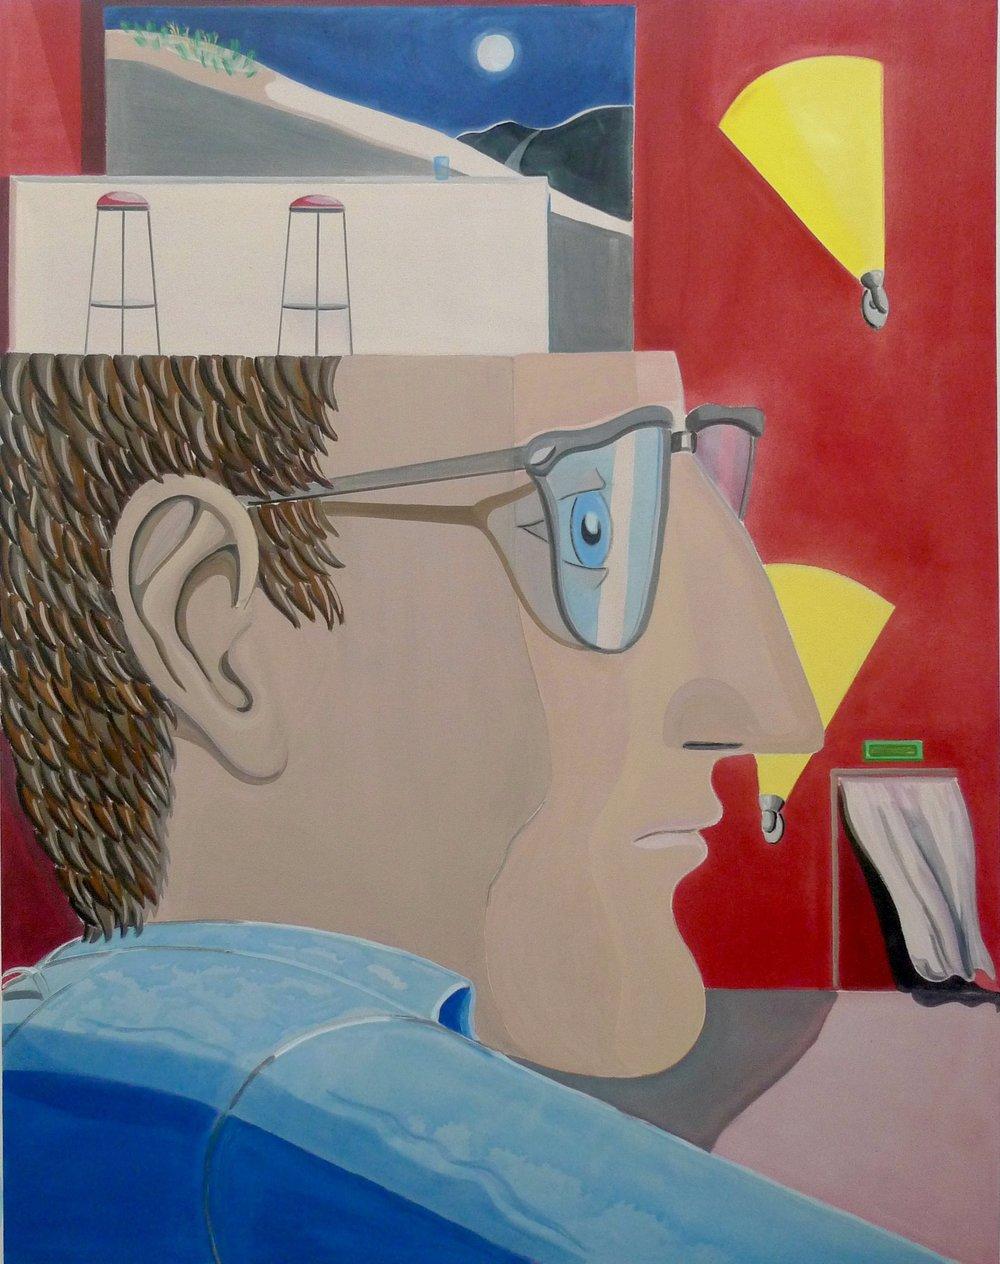 Night Customer  2014 Acrylic on canvas, 178 x 138 cm